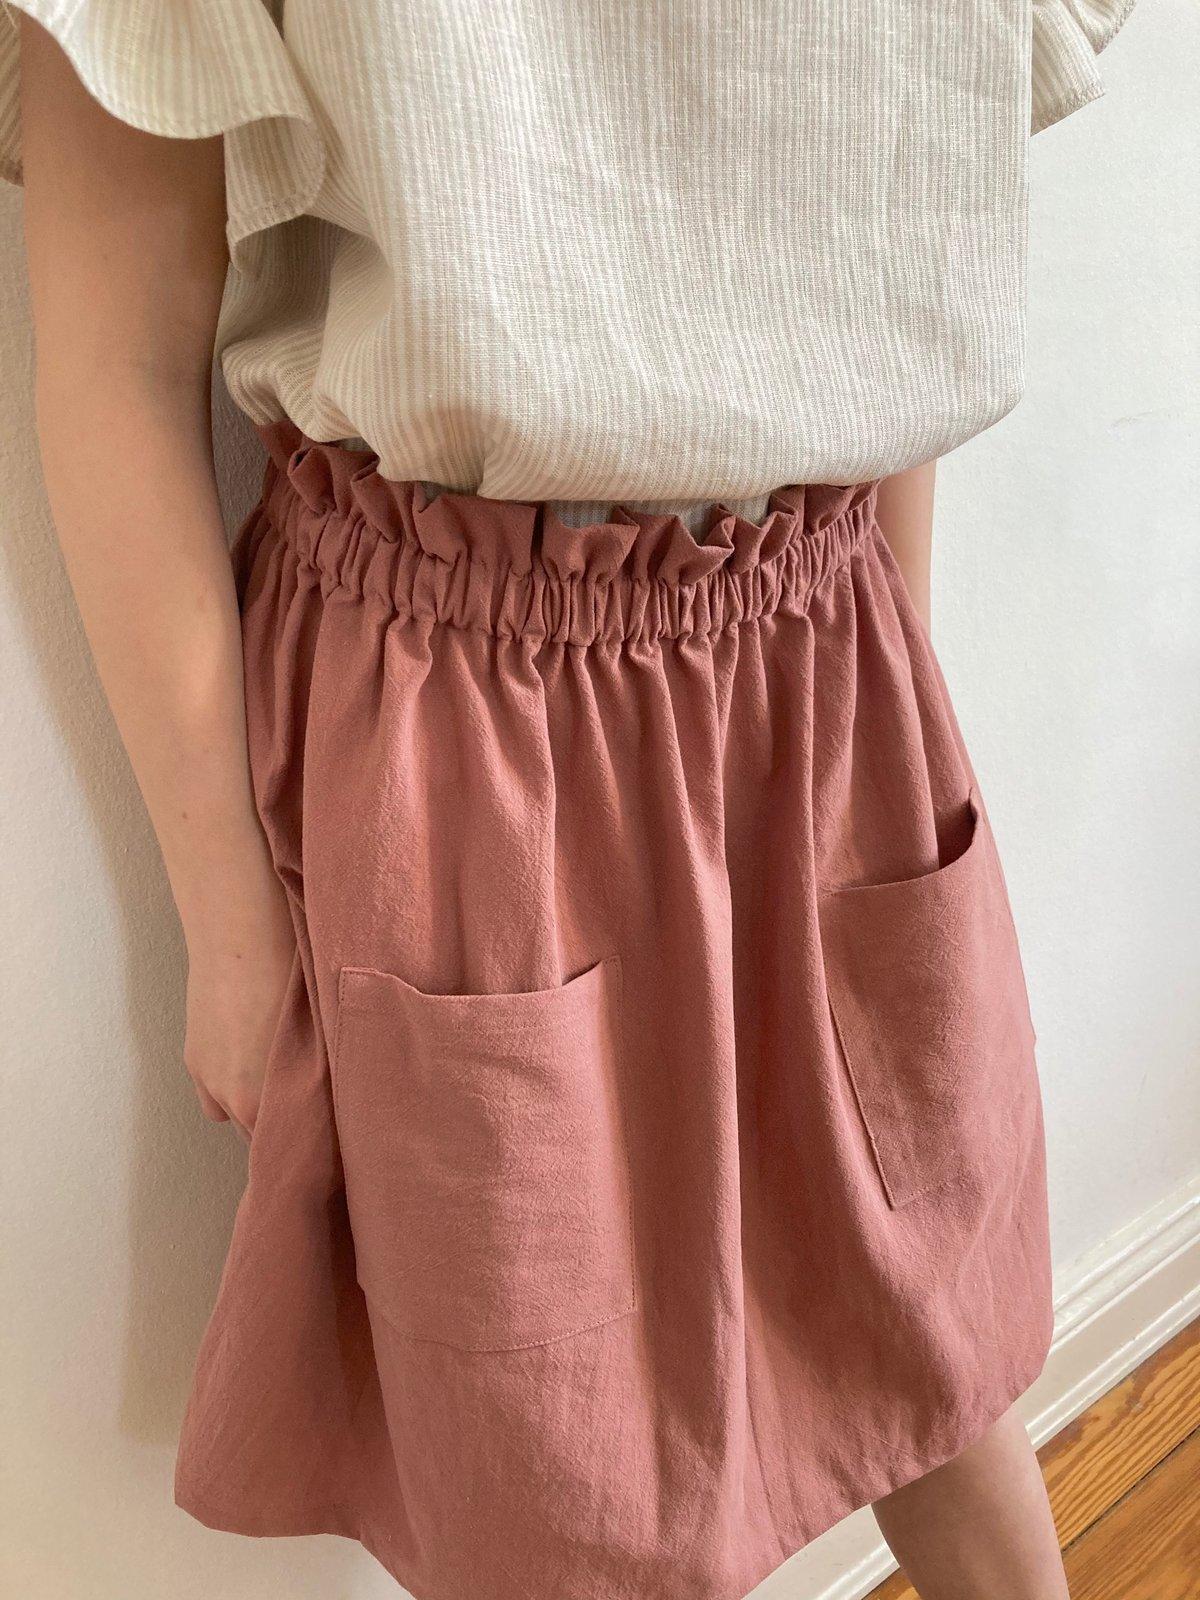 Market Skirt-clay pink